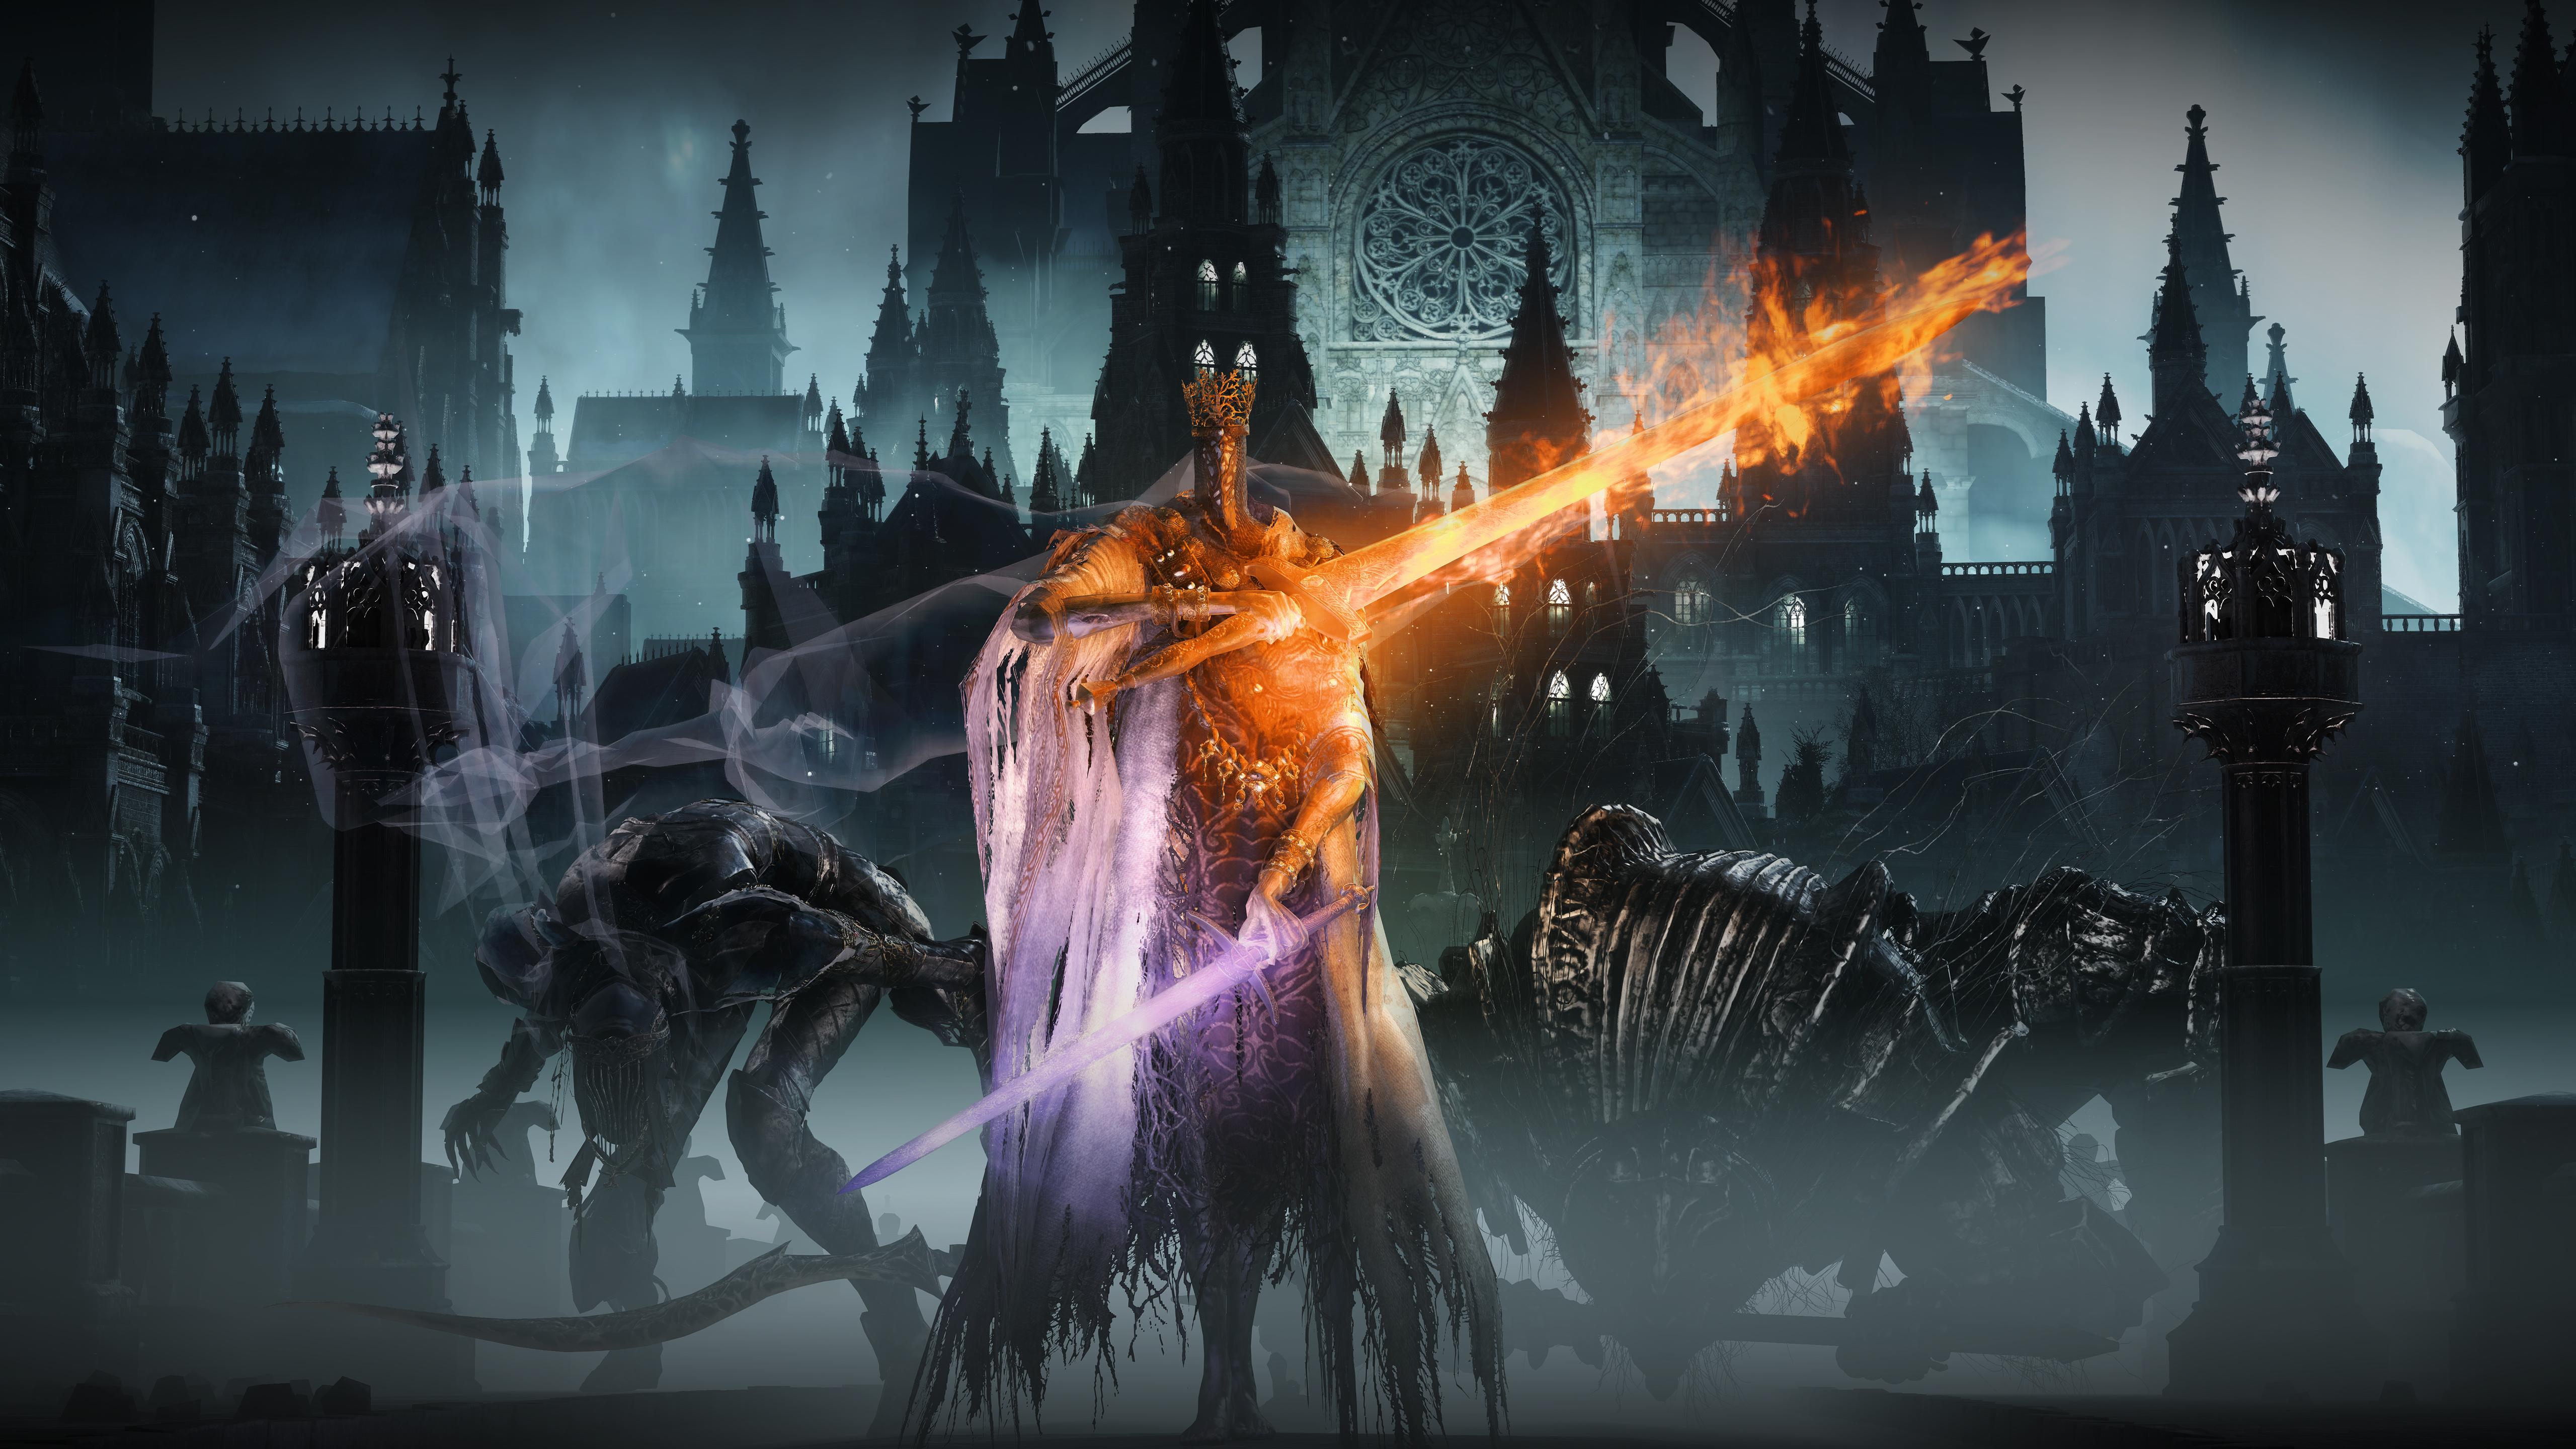 Dark Souls 3 5k, HD Games, 4k Wallpapers, Images ...